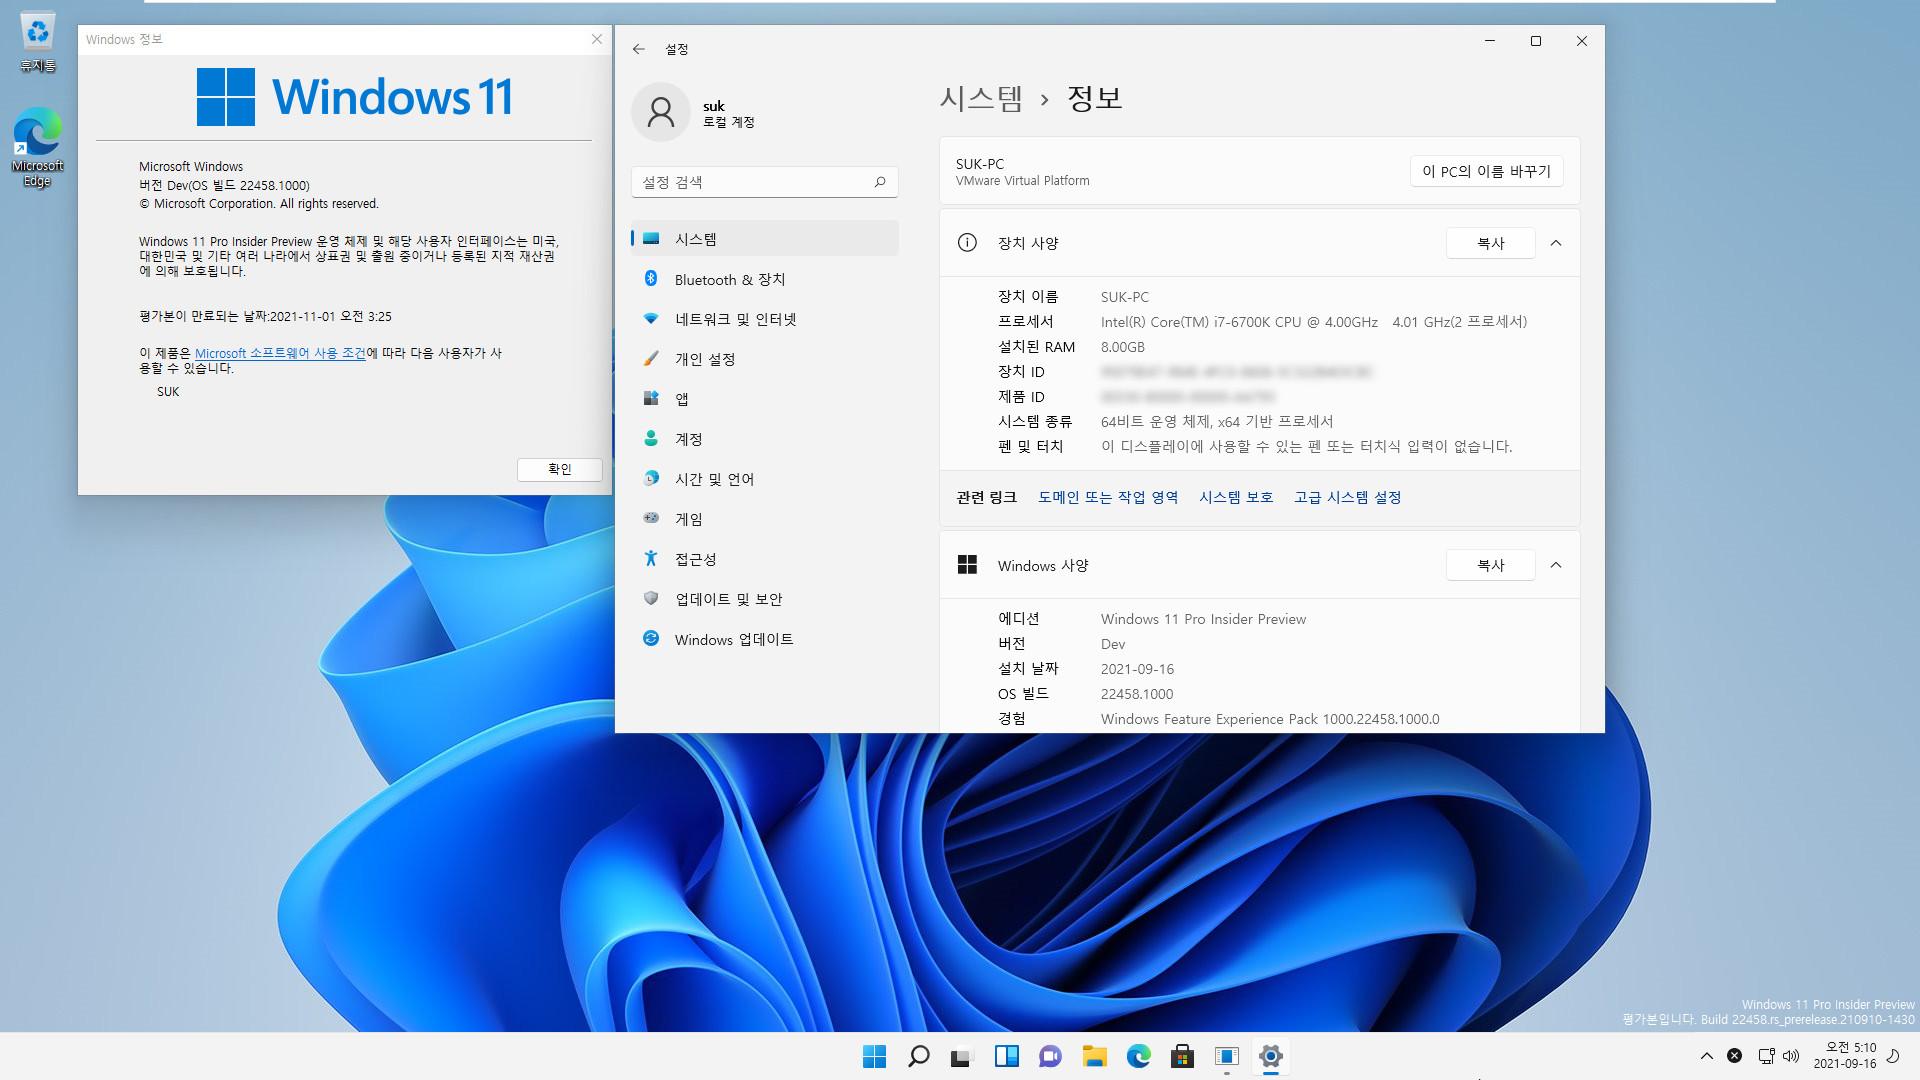 Windows 11 인사이더 프리뷰 - 버전 Dev (OS 빌드 22458.1000) 나왔네요 - 개발자 채널 - uup 사이트 2군데 전부 한국어 iso가 install.wim 단계에서 오류가 생겨서 윈도우 업데이트에서 uup 파일들 다운로드하여 iso 만드는데 성공했습니다 2021-09-16_051042.jpg